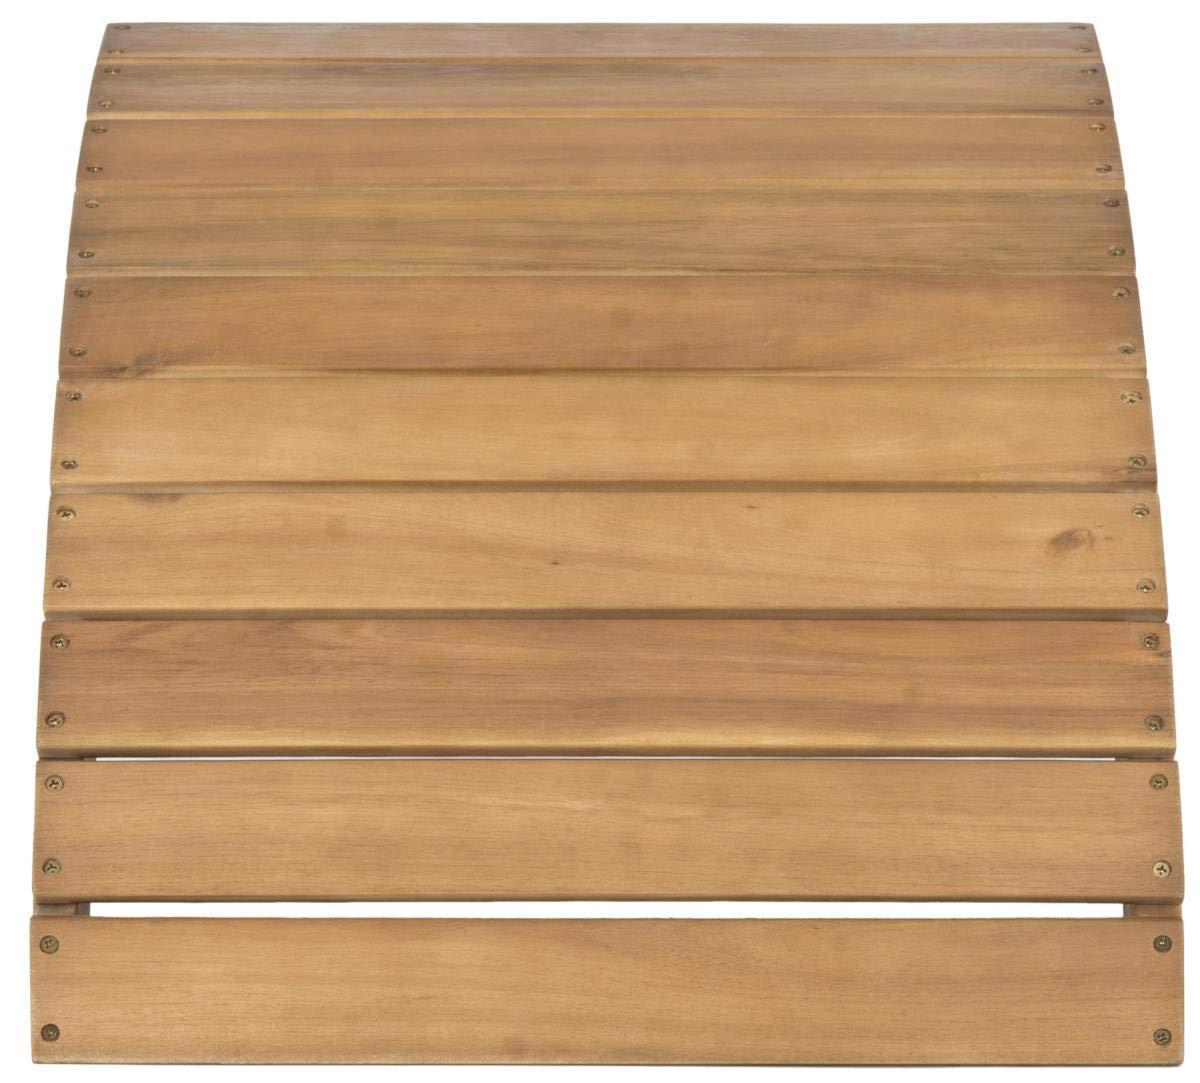 Safavieh Patio Collection Hampton Adirondack Acacia Wood Ottoman, Natural by Safavieh